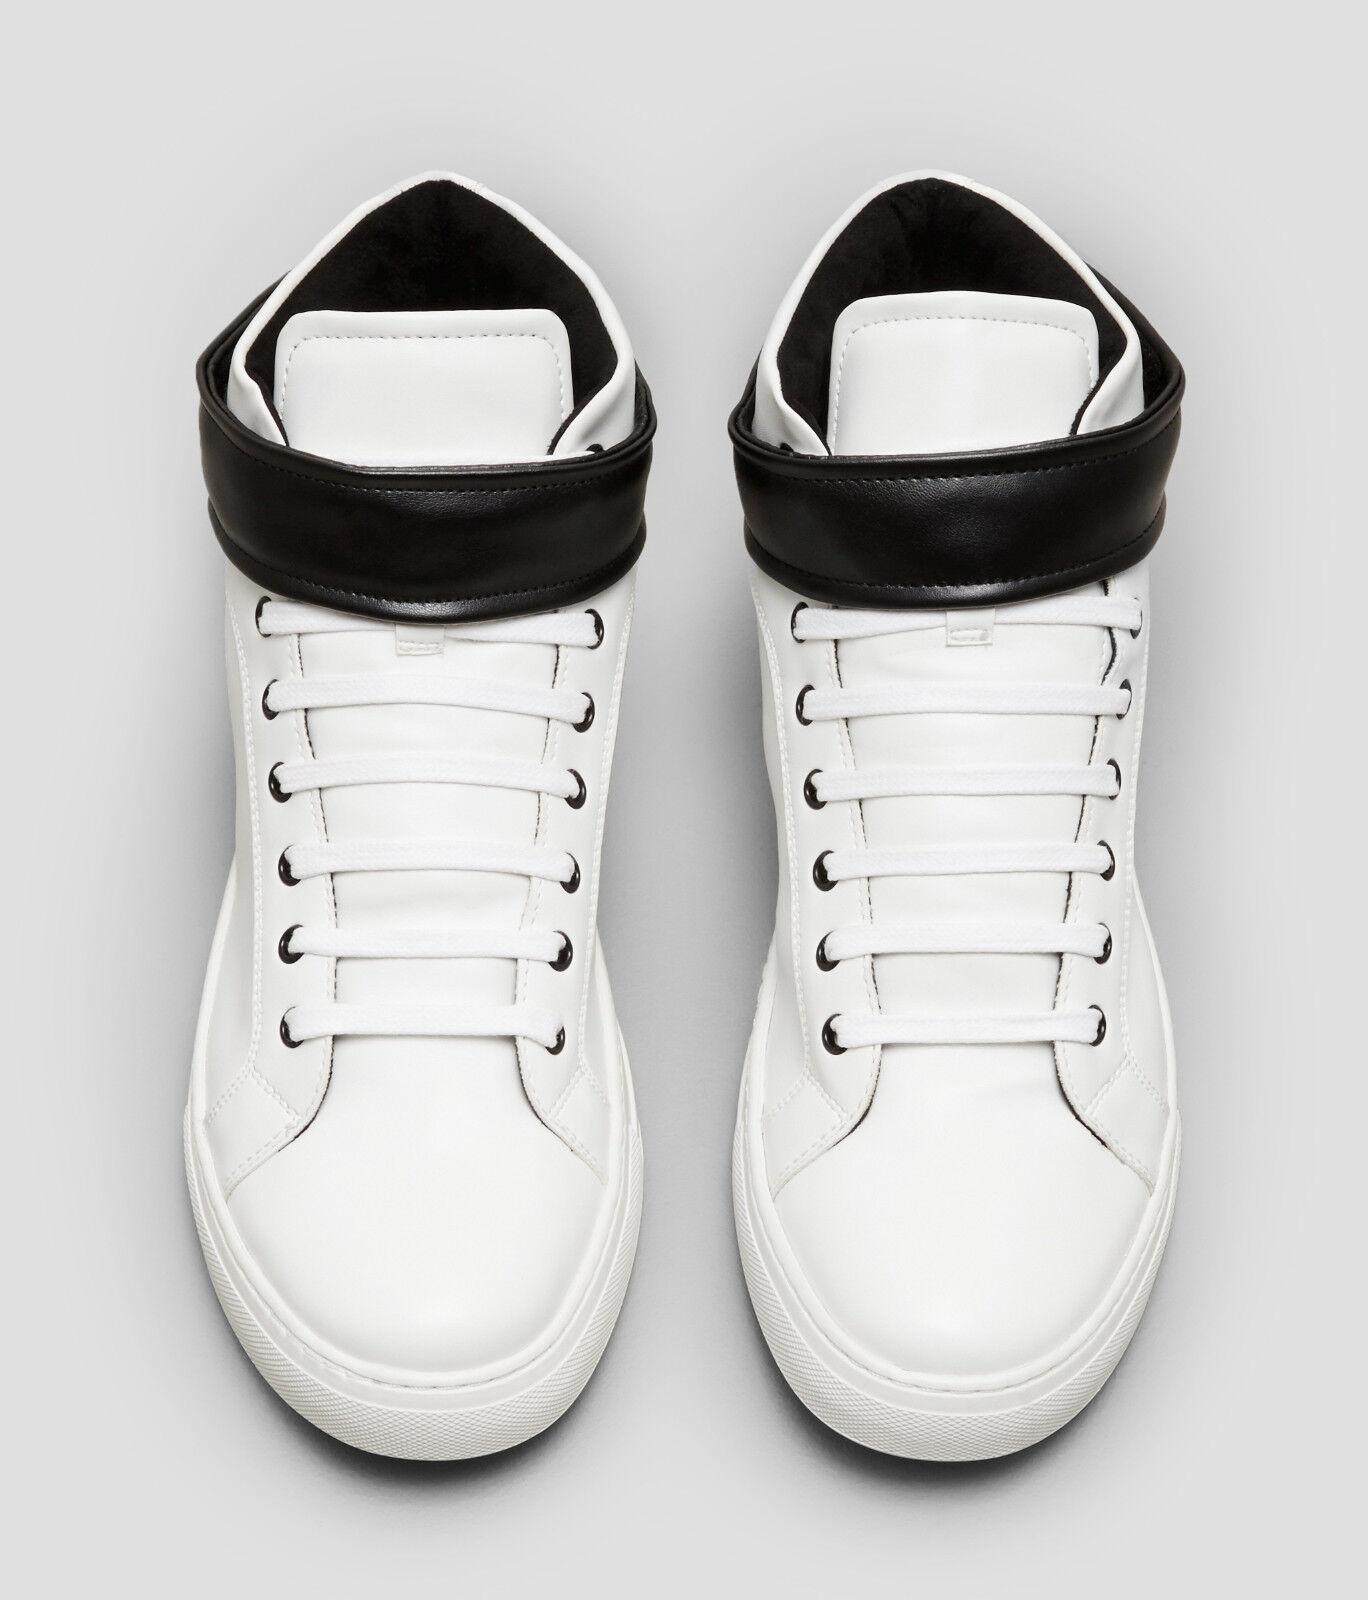 Scarpe casual da uomo  $160.00 kenneth Cole DOUBLE SNEAKER POINT II HIGH-TOP SNEAKER DOUBLE - WHITE, Size 7 855c81